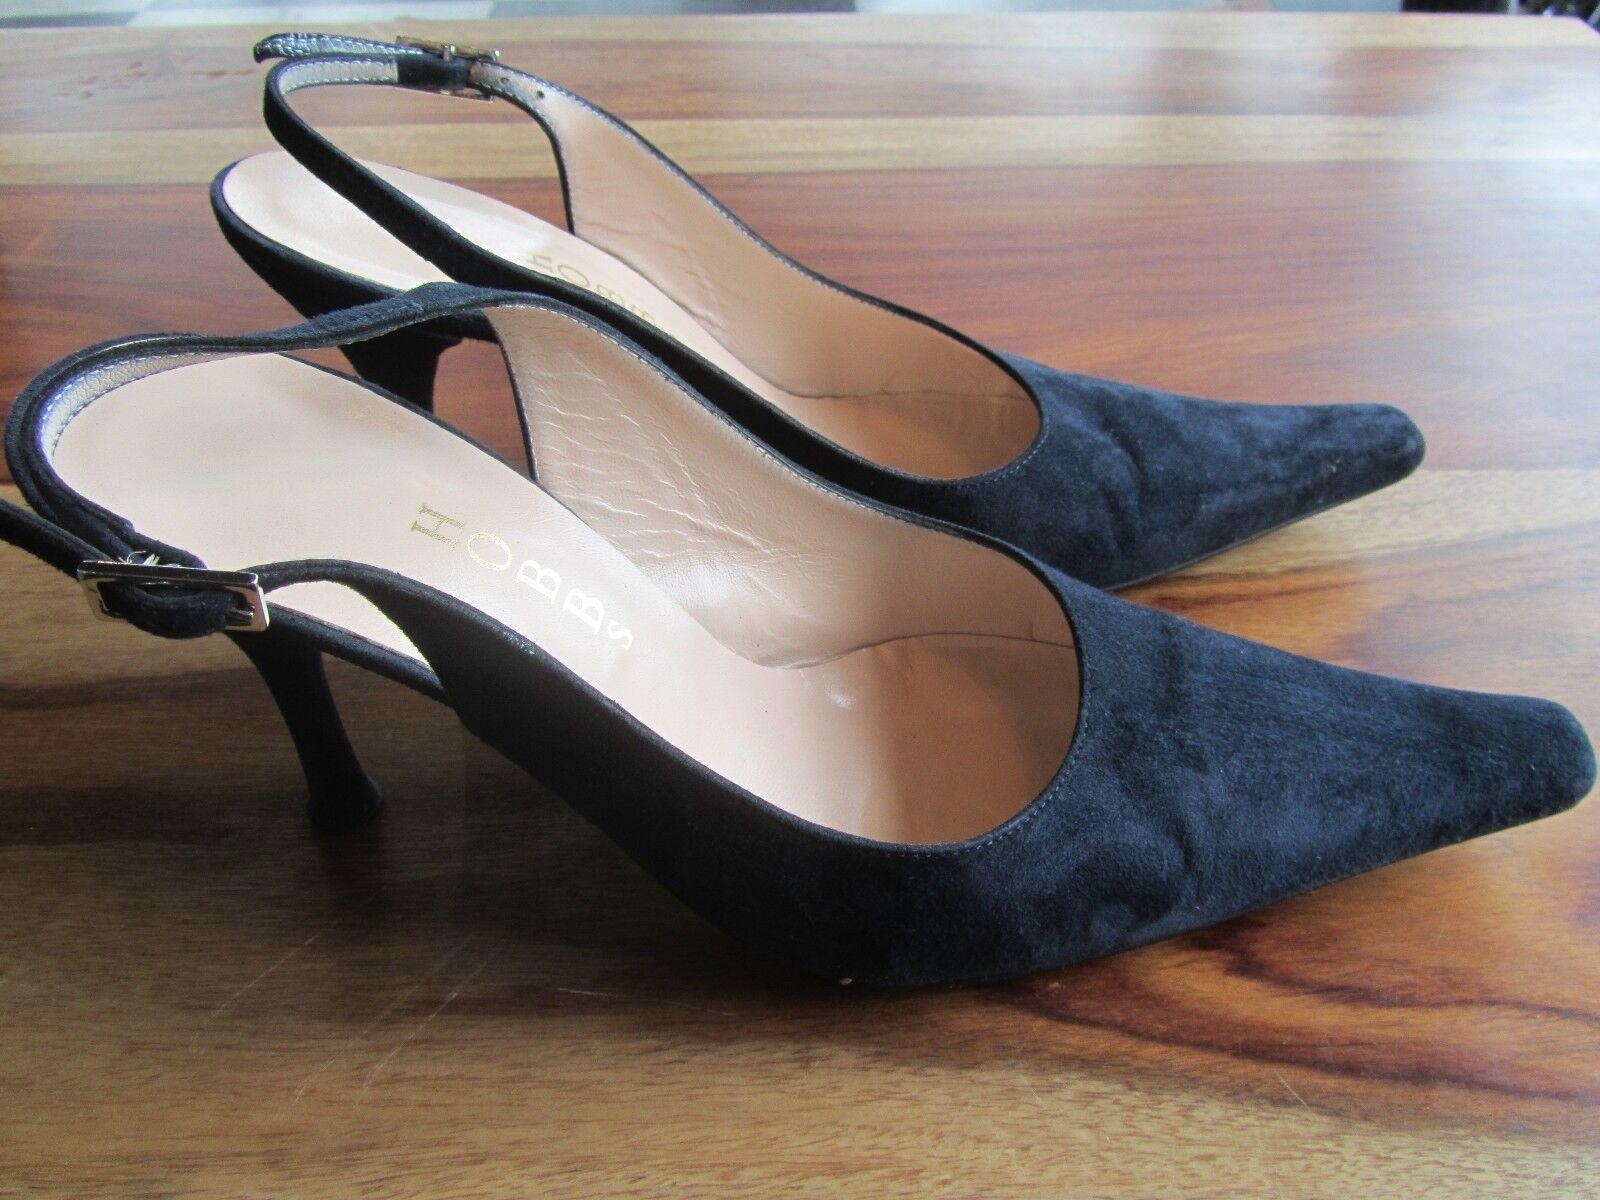 GORGEOUS SLINGBACK HOBBS SILVIA NAVY SUEDE SLINGBACK GORGEOUS Schuhe SIZE 36 80mm HEELS a317e2